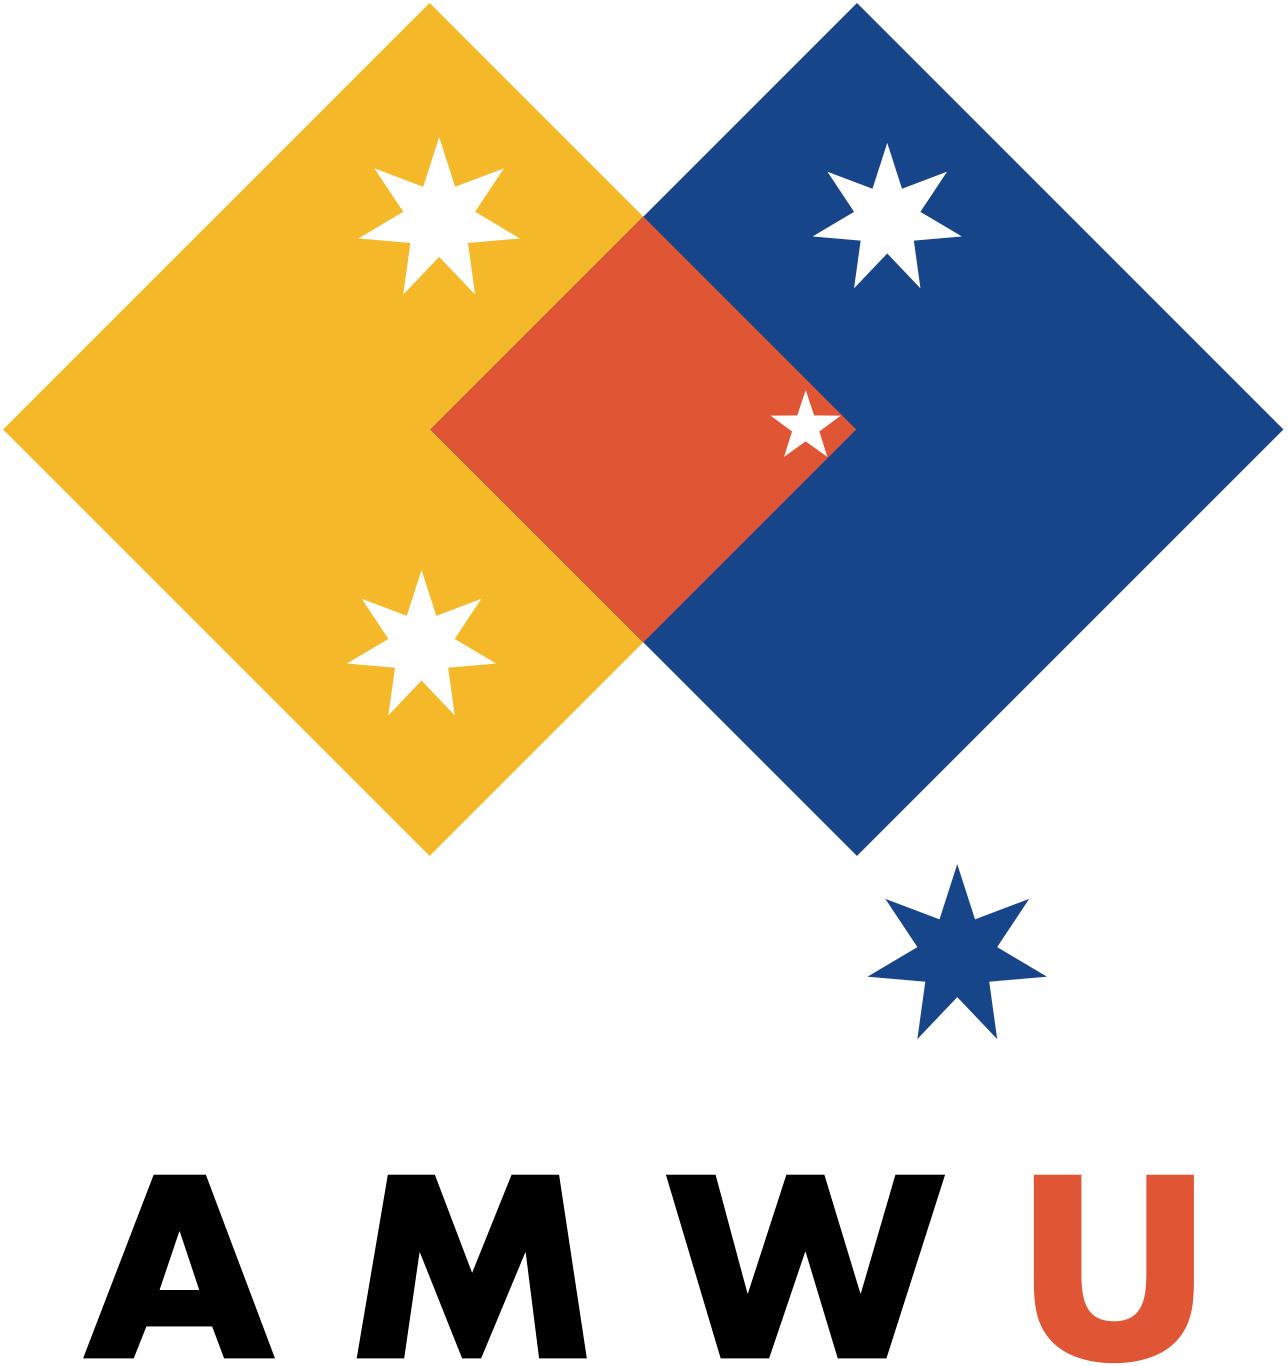 AMWU_logo_PNG.png